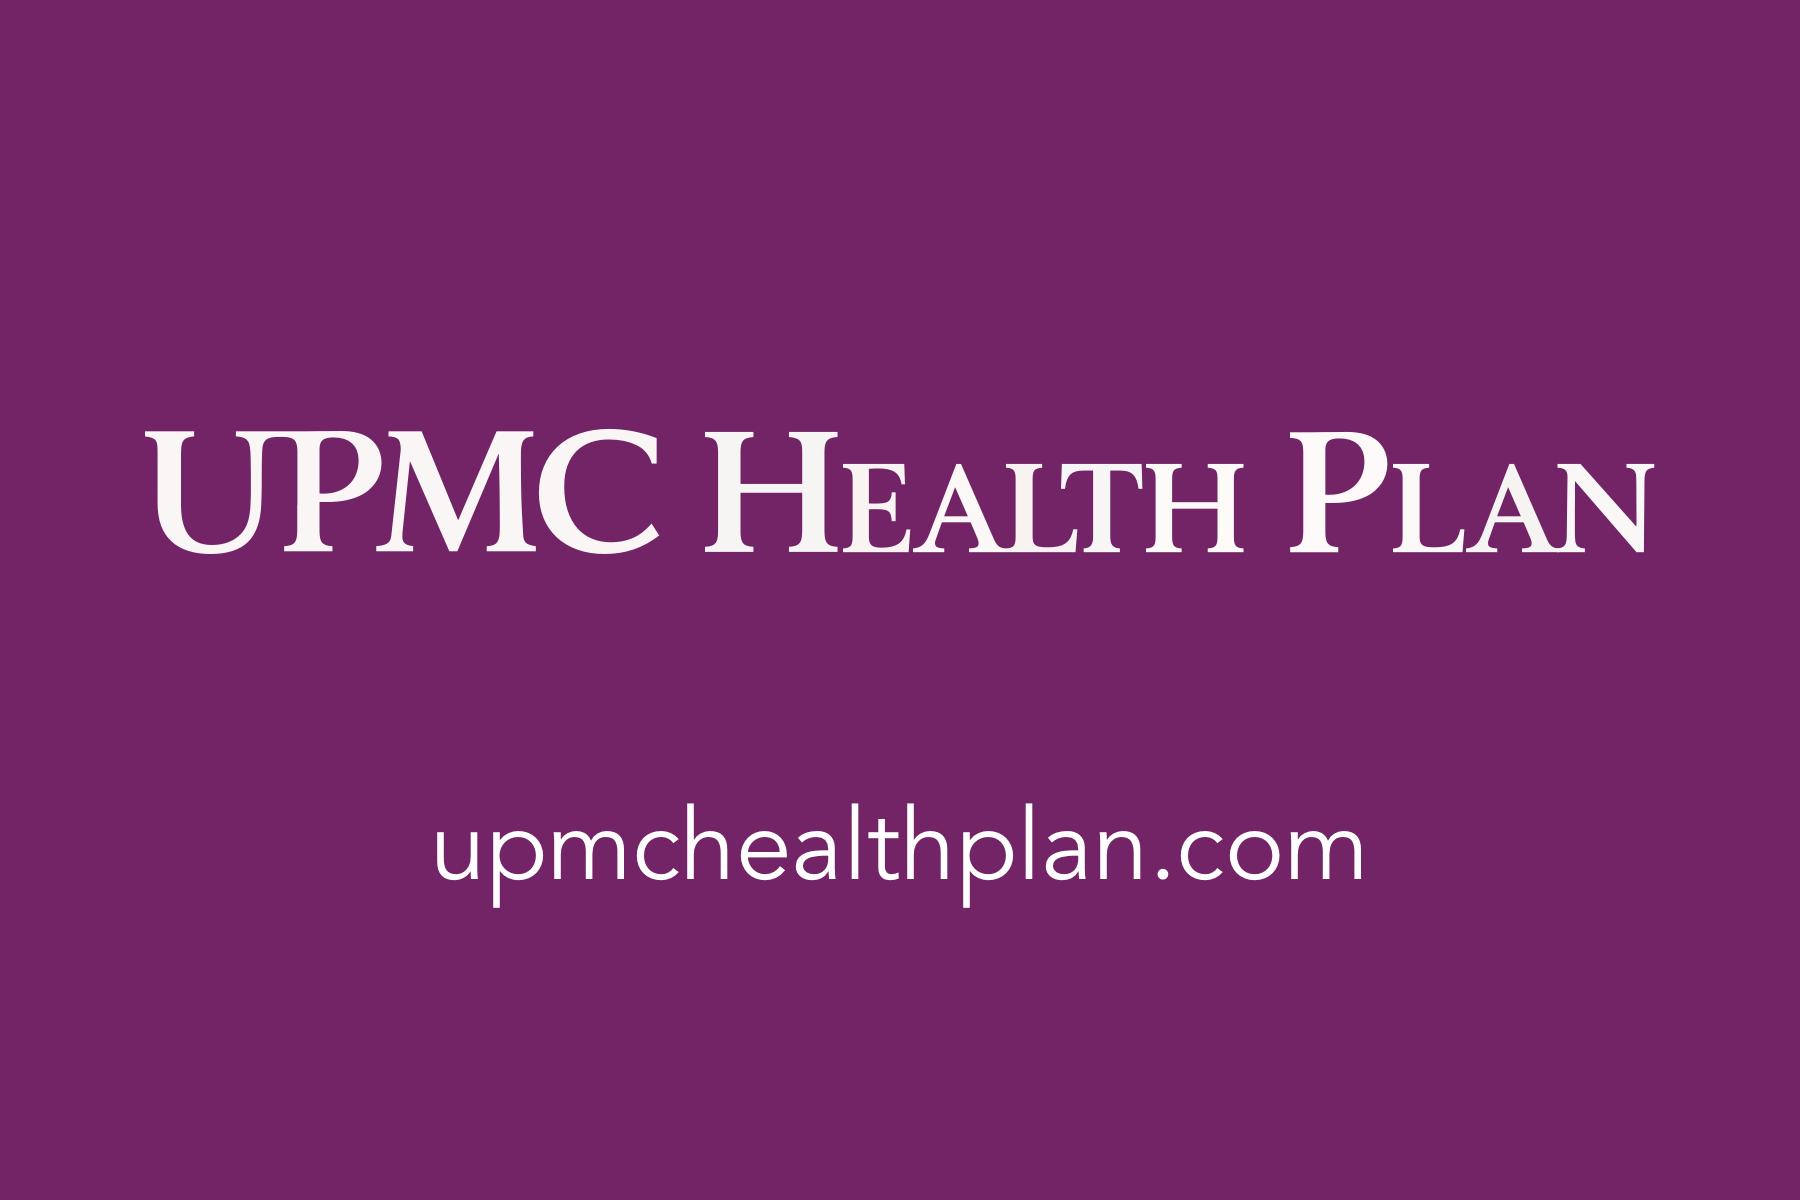 UPMC Health - Web Banner